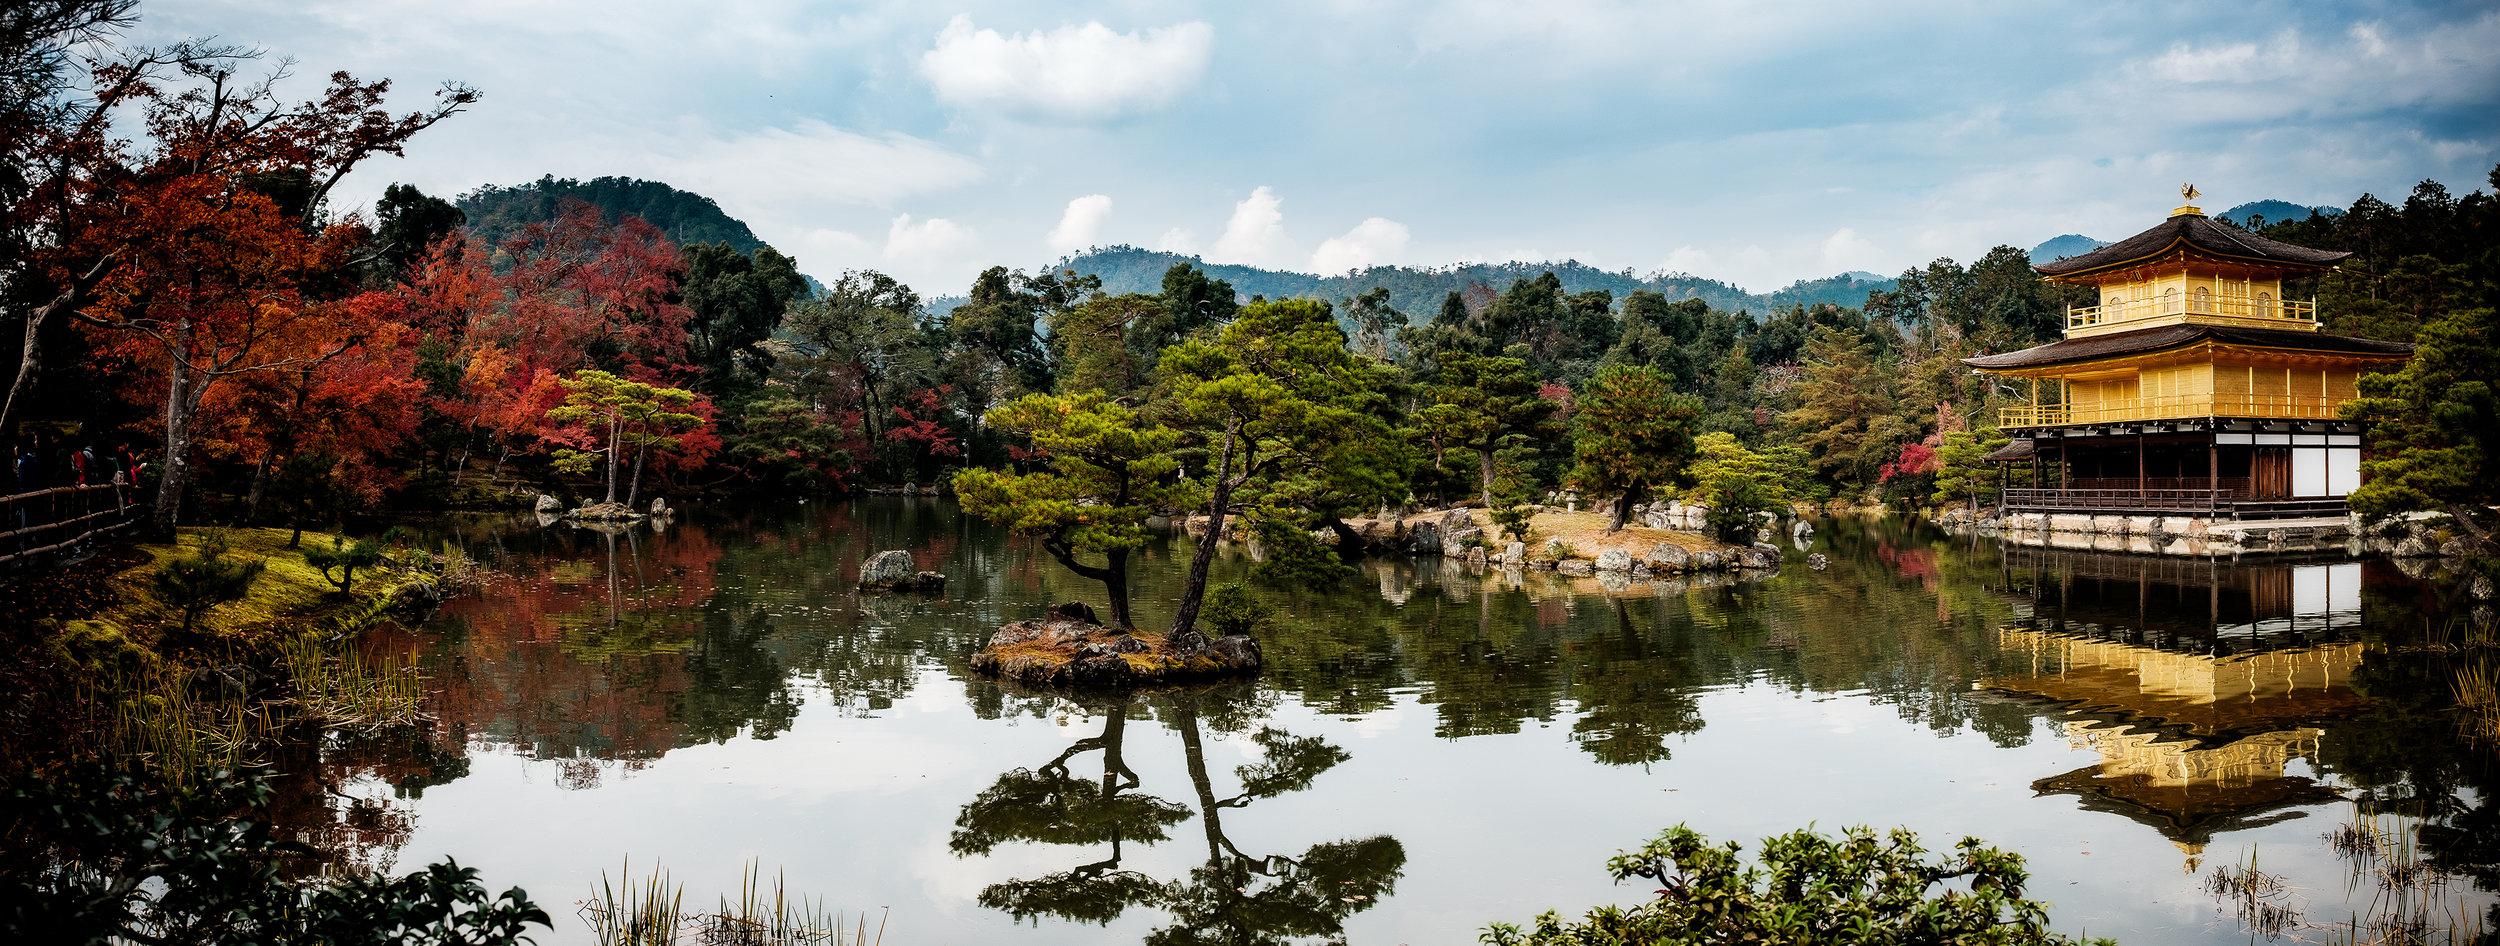 KYOTO-JAPAN---NOVEMBER-28-2018---KINKAKUJI-GOLDEN-PAVILION-REFLECTION.jpg